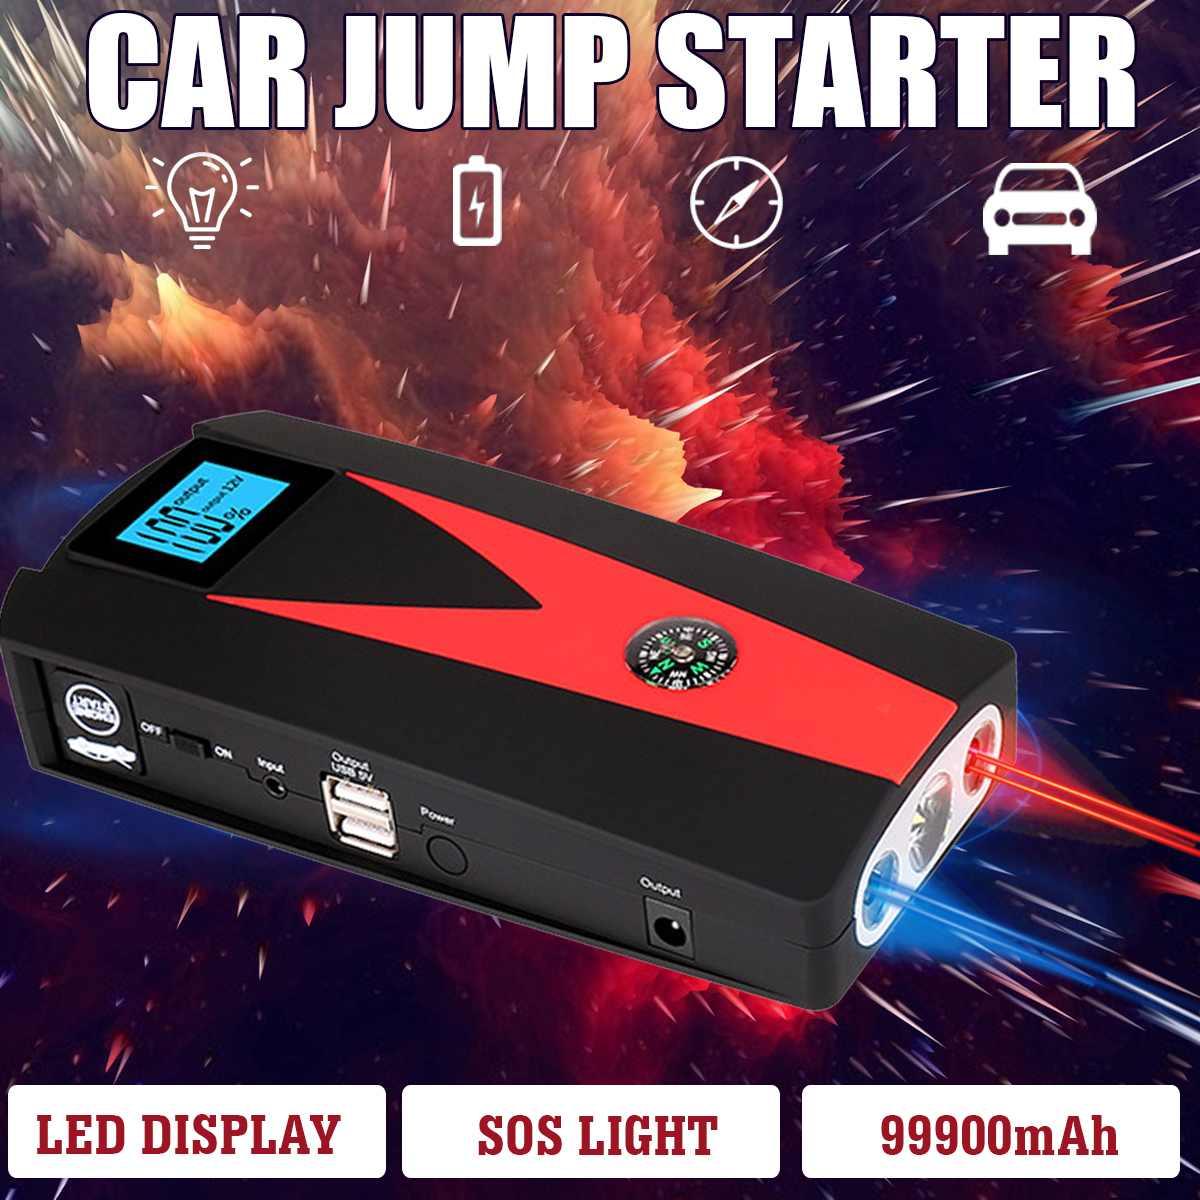 12V 82800/99900mAh Tragbare Auto Starthilfe Booster Batterie Ladegerät USB Ladegerät Notfall Kräfte Auto LED Für ausgangs Gerät